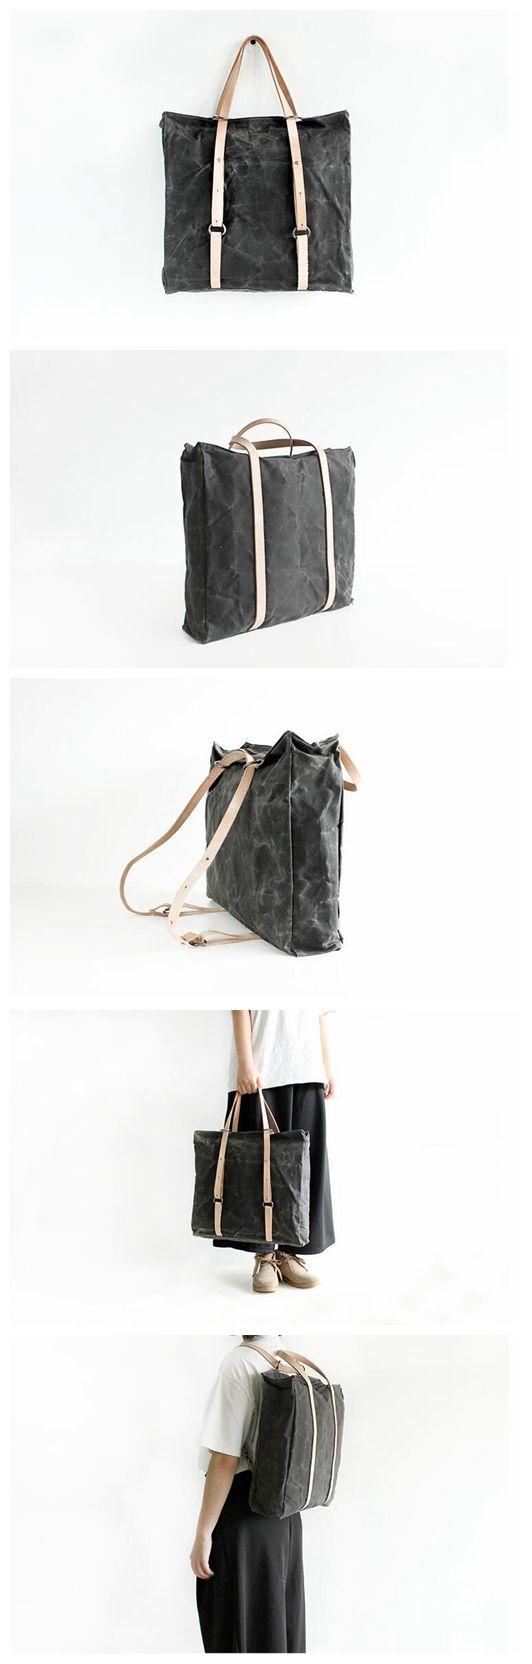 Best 25  Canvas leather ideas on Pinterest